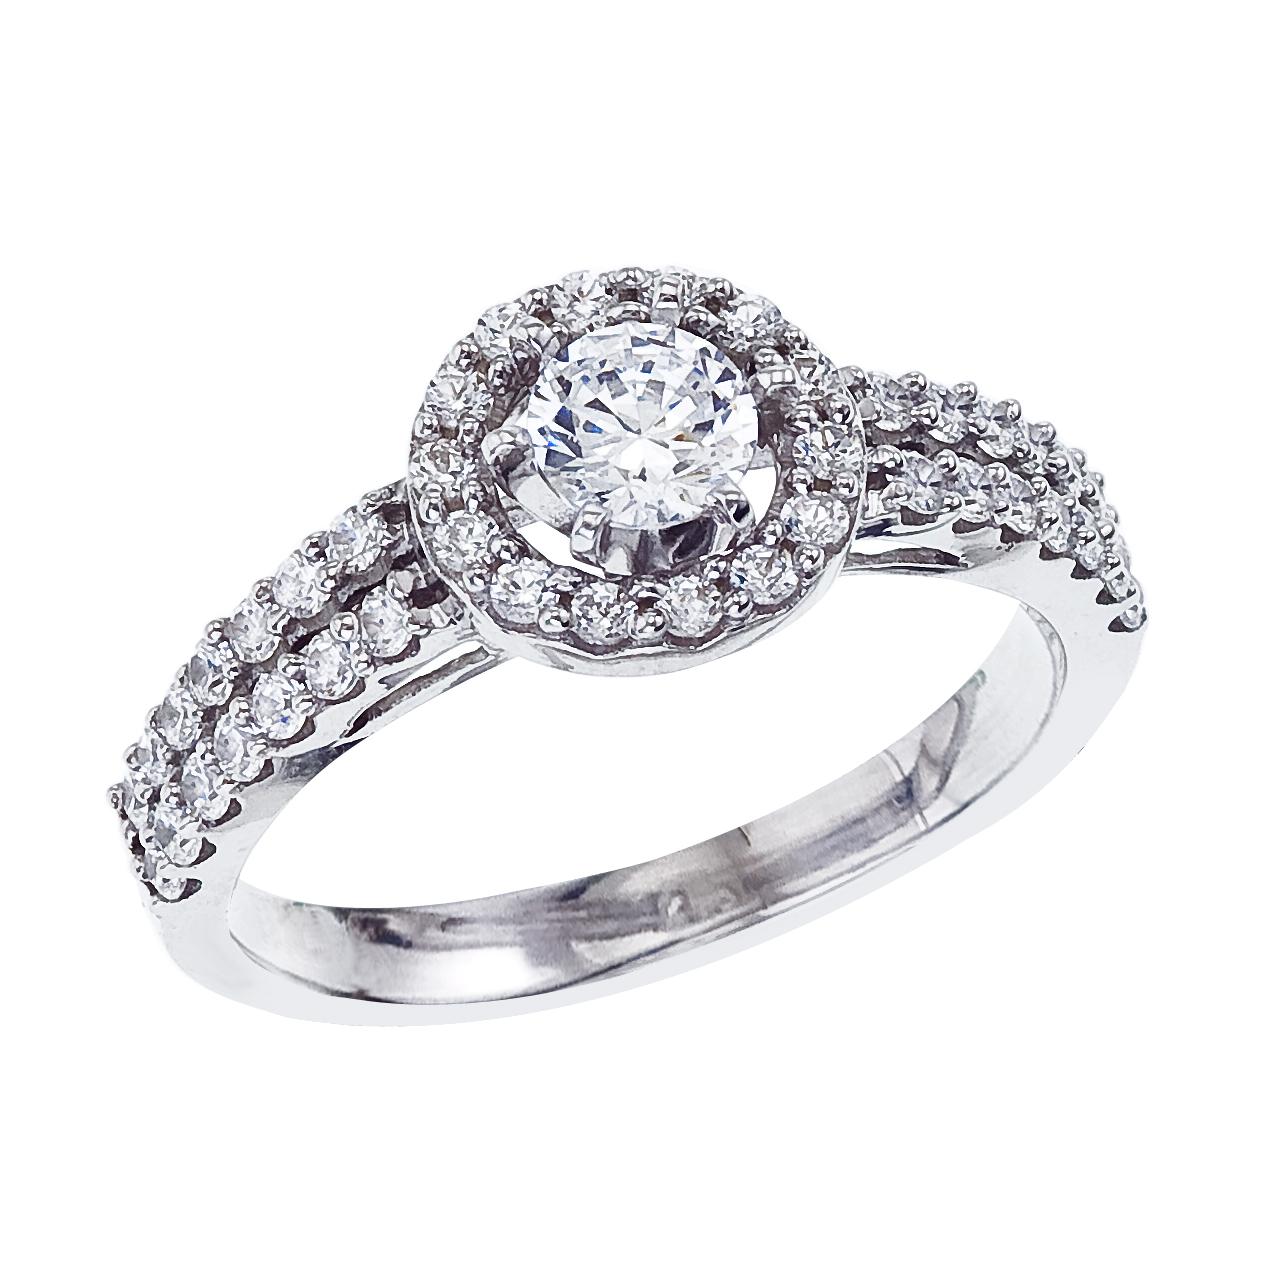 14k White gold Classic Diamond QPID Engagement Ring (0.19 tcw)